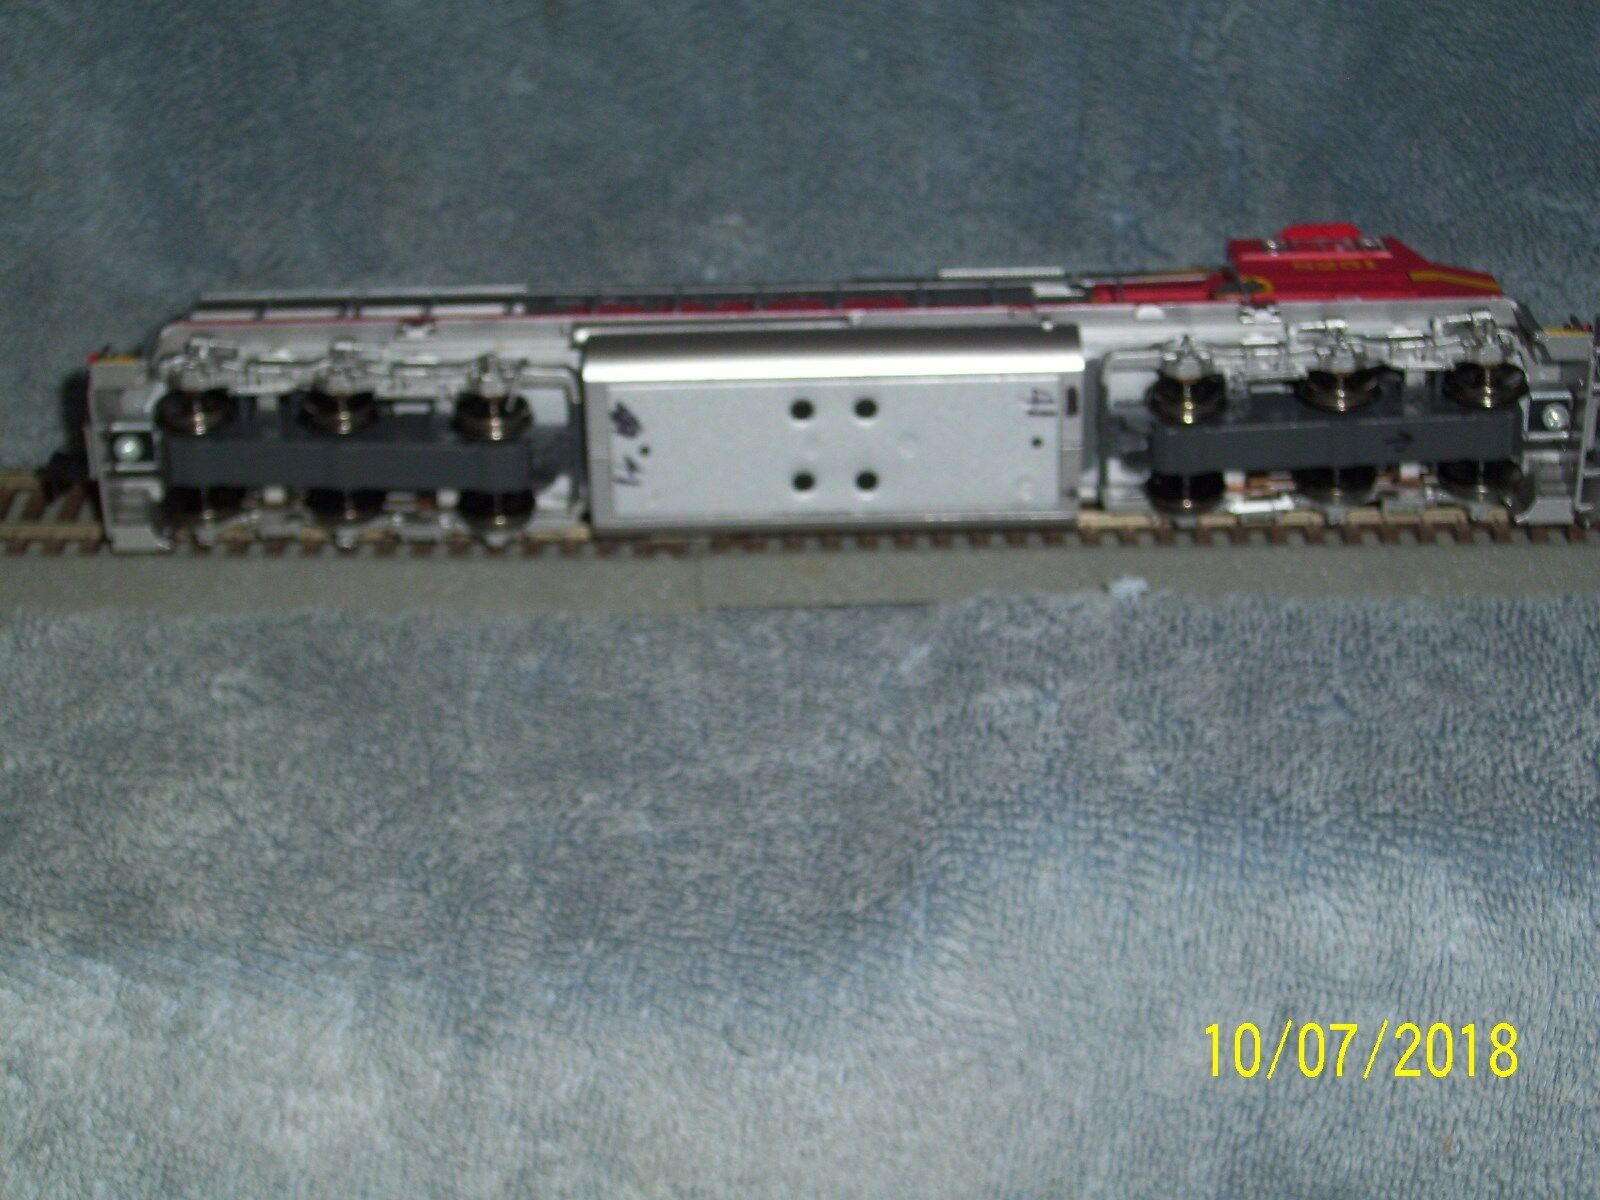 ATHEARN GENESIS HO SCALE G6135 SD75M SD75M SD75M BNSF  8251 w DCC f18734